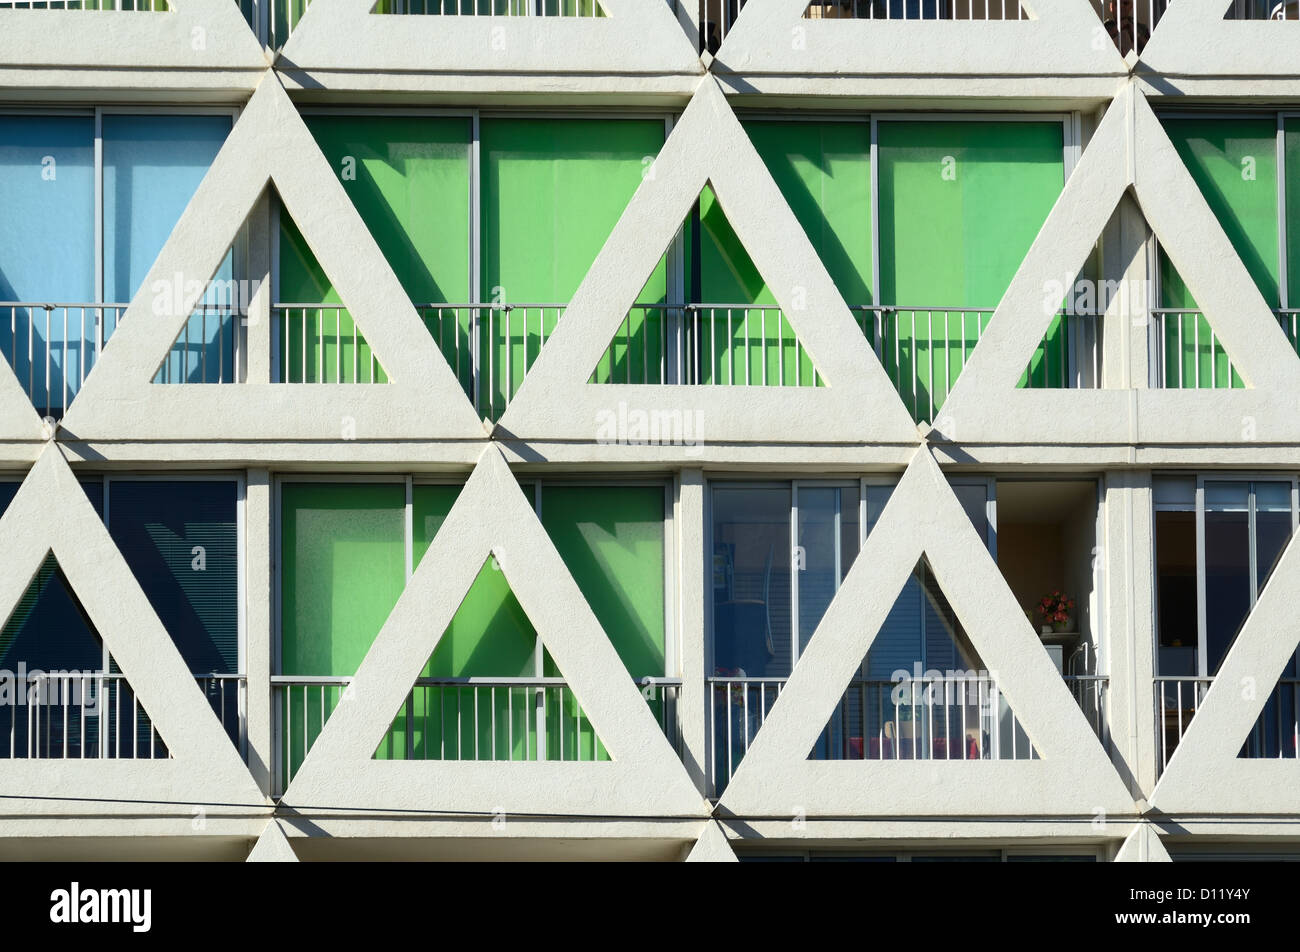 Triangular Facade Les Voiles Blanches Apartments La Grande-Motte Hérault France - Stock Image